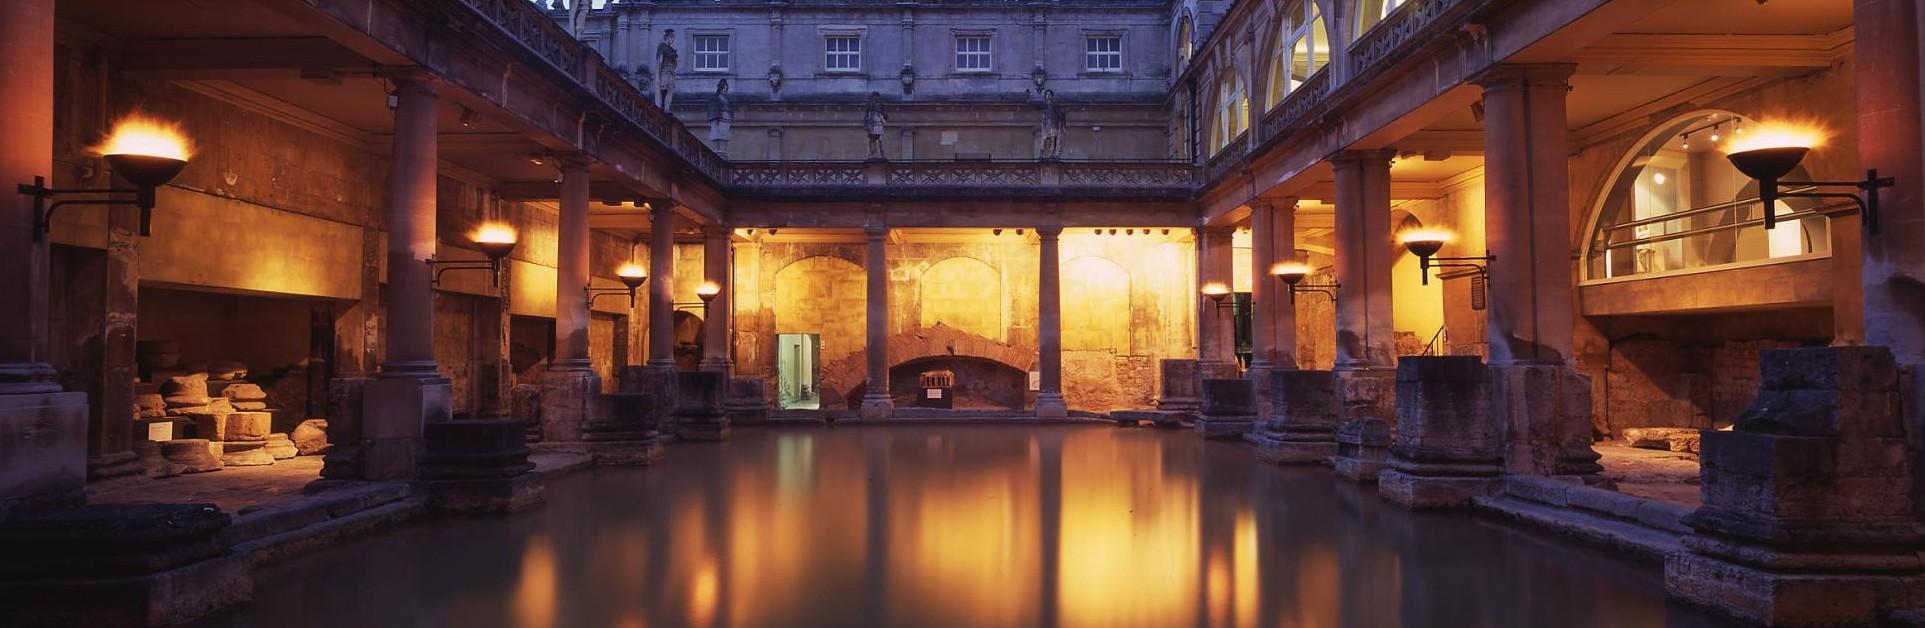 Estância Termal Romana em Inglaterra